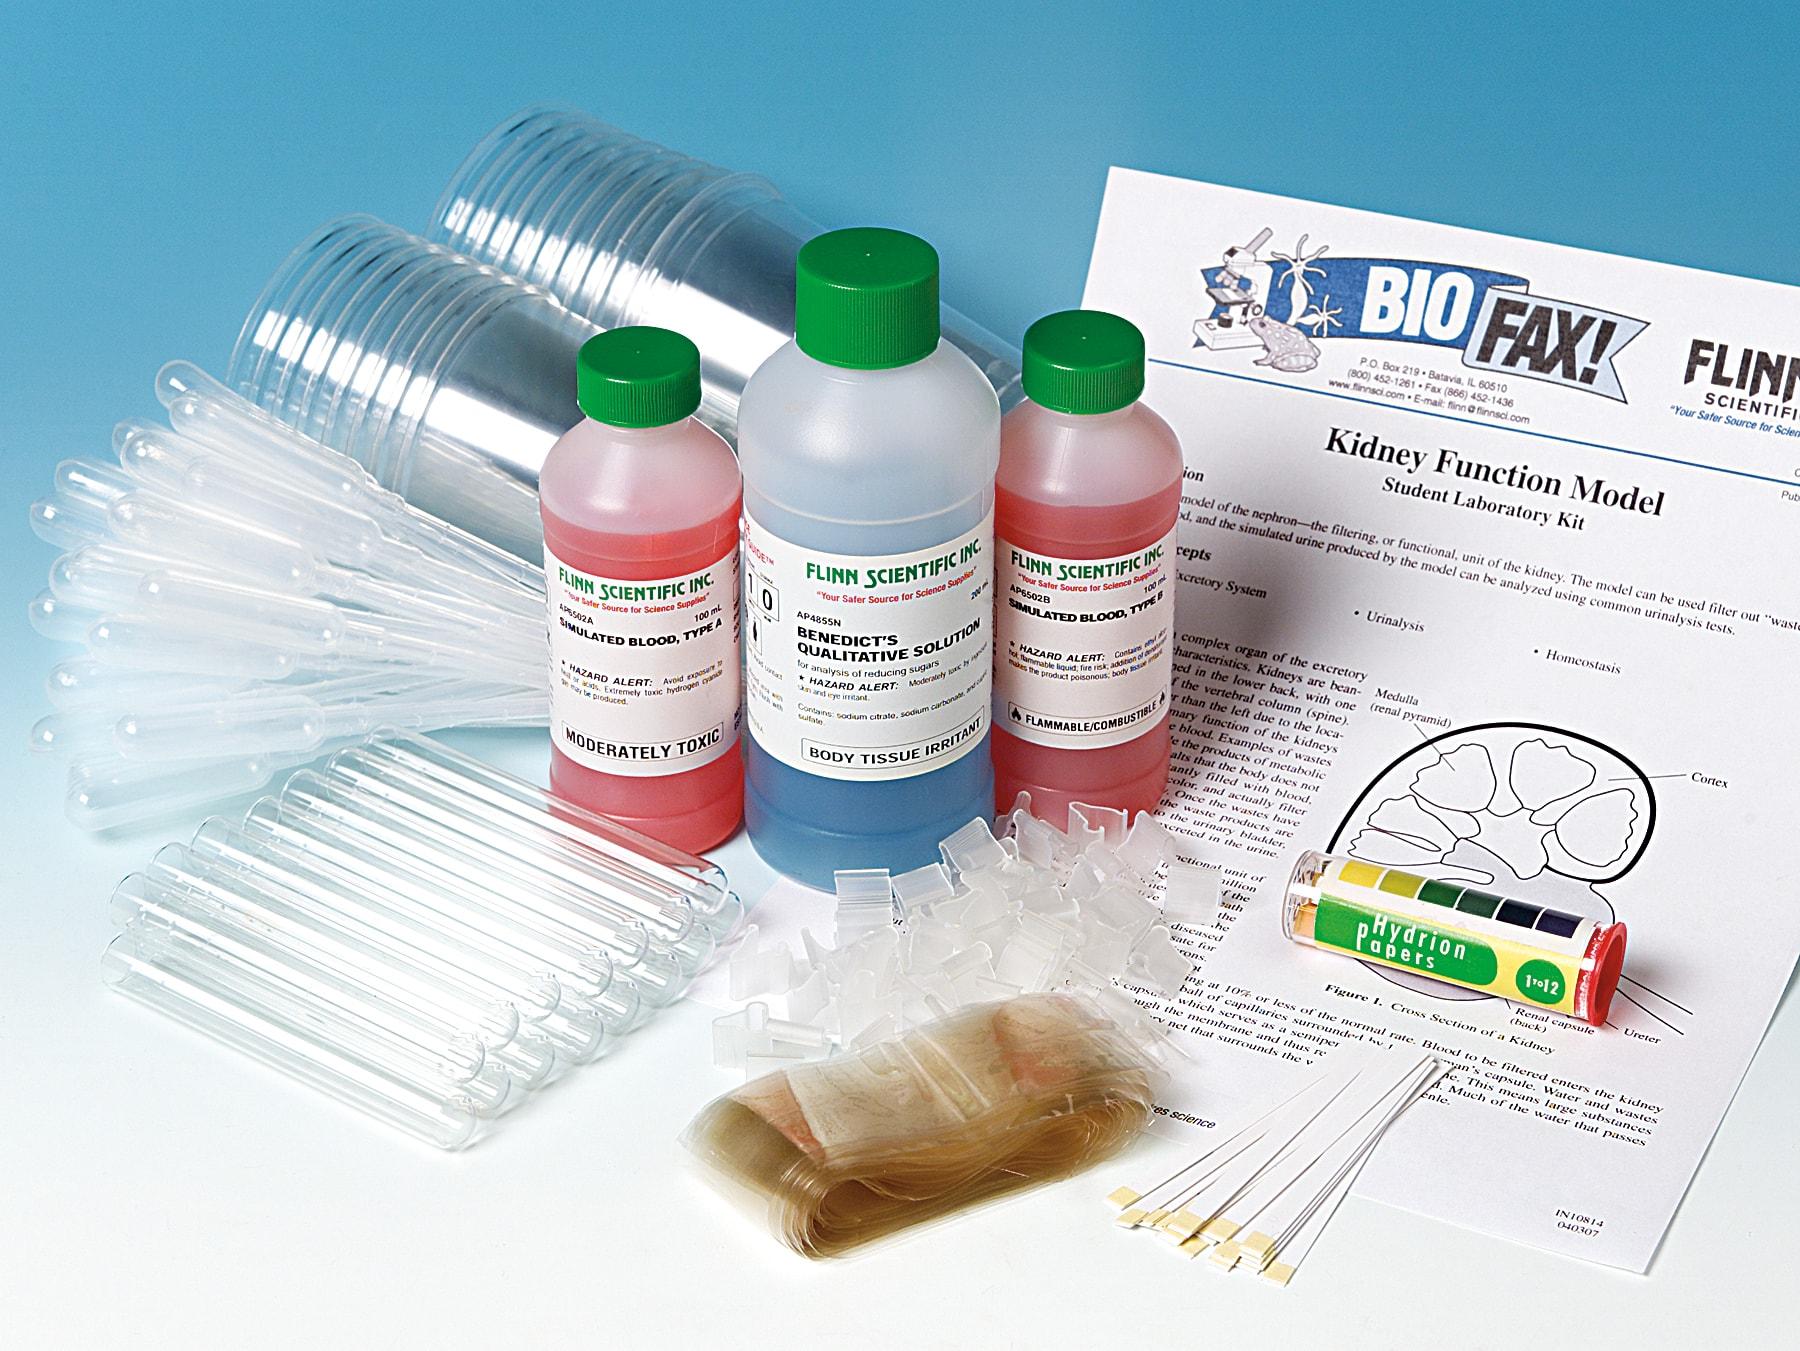 Kidney Function Model - Student Laboratory Kit